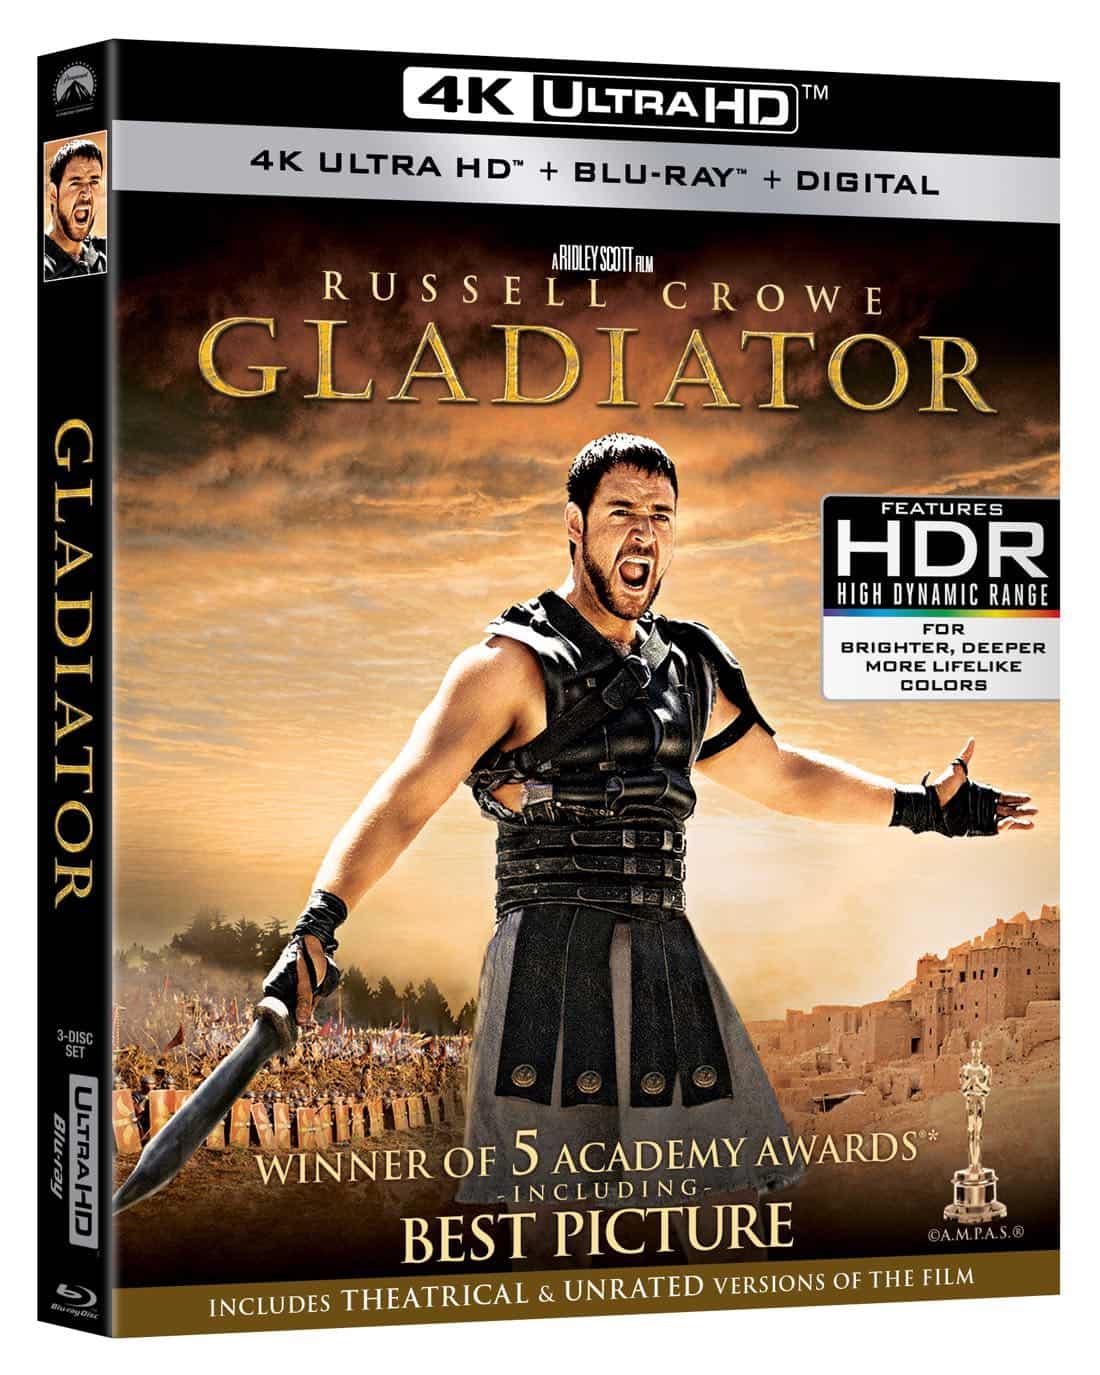 Gladiator-4k-Ultra-HD-Bluray-Digital-Box-Cover-Artwork2